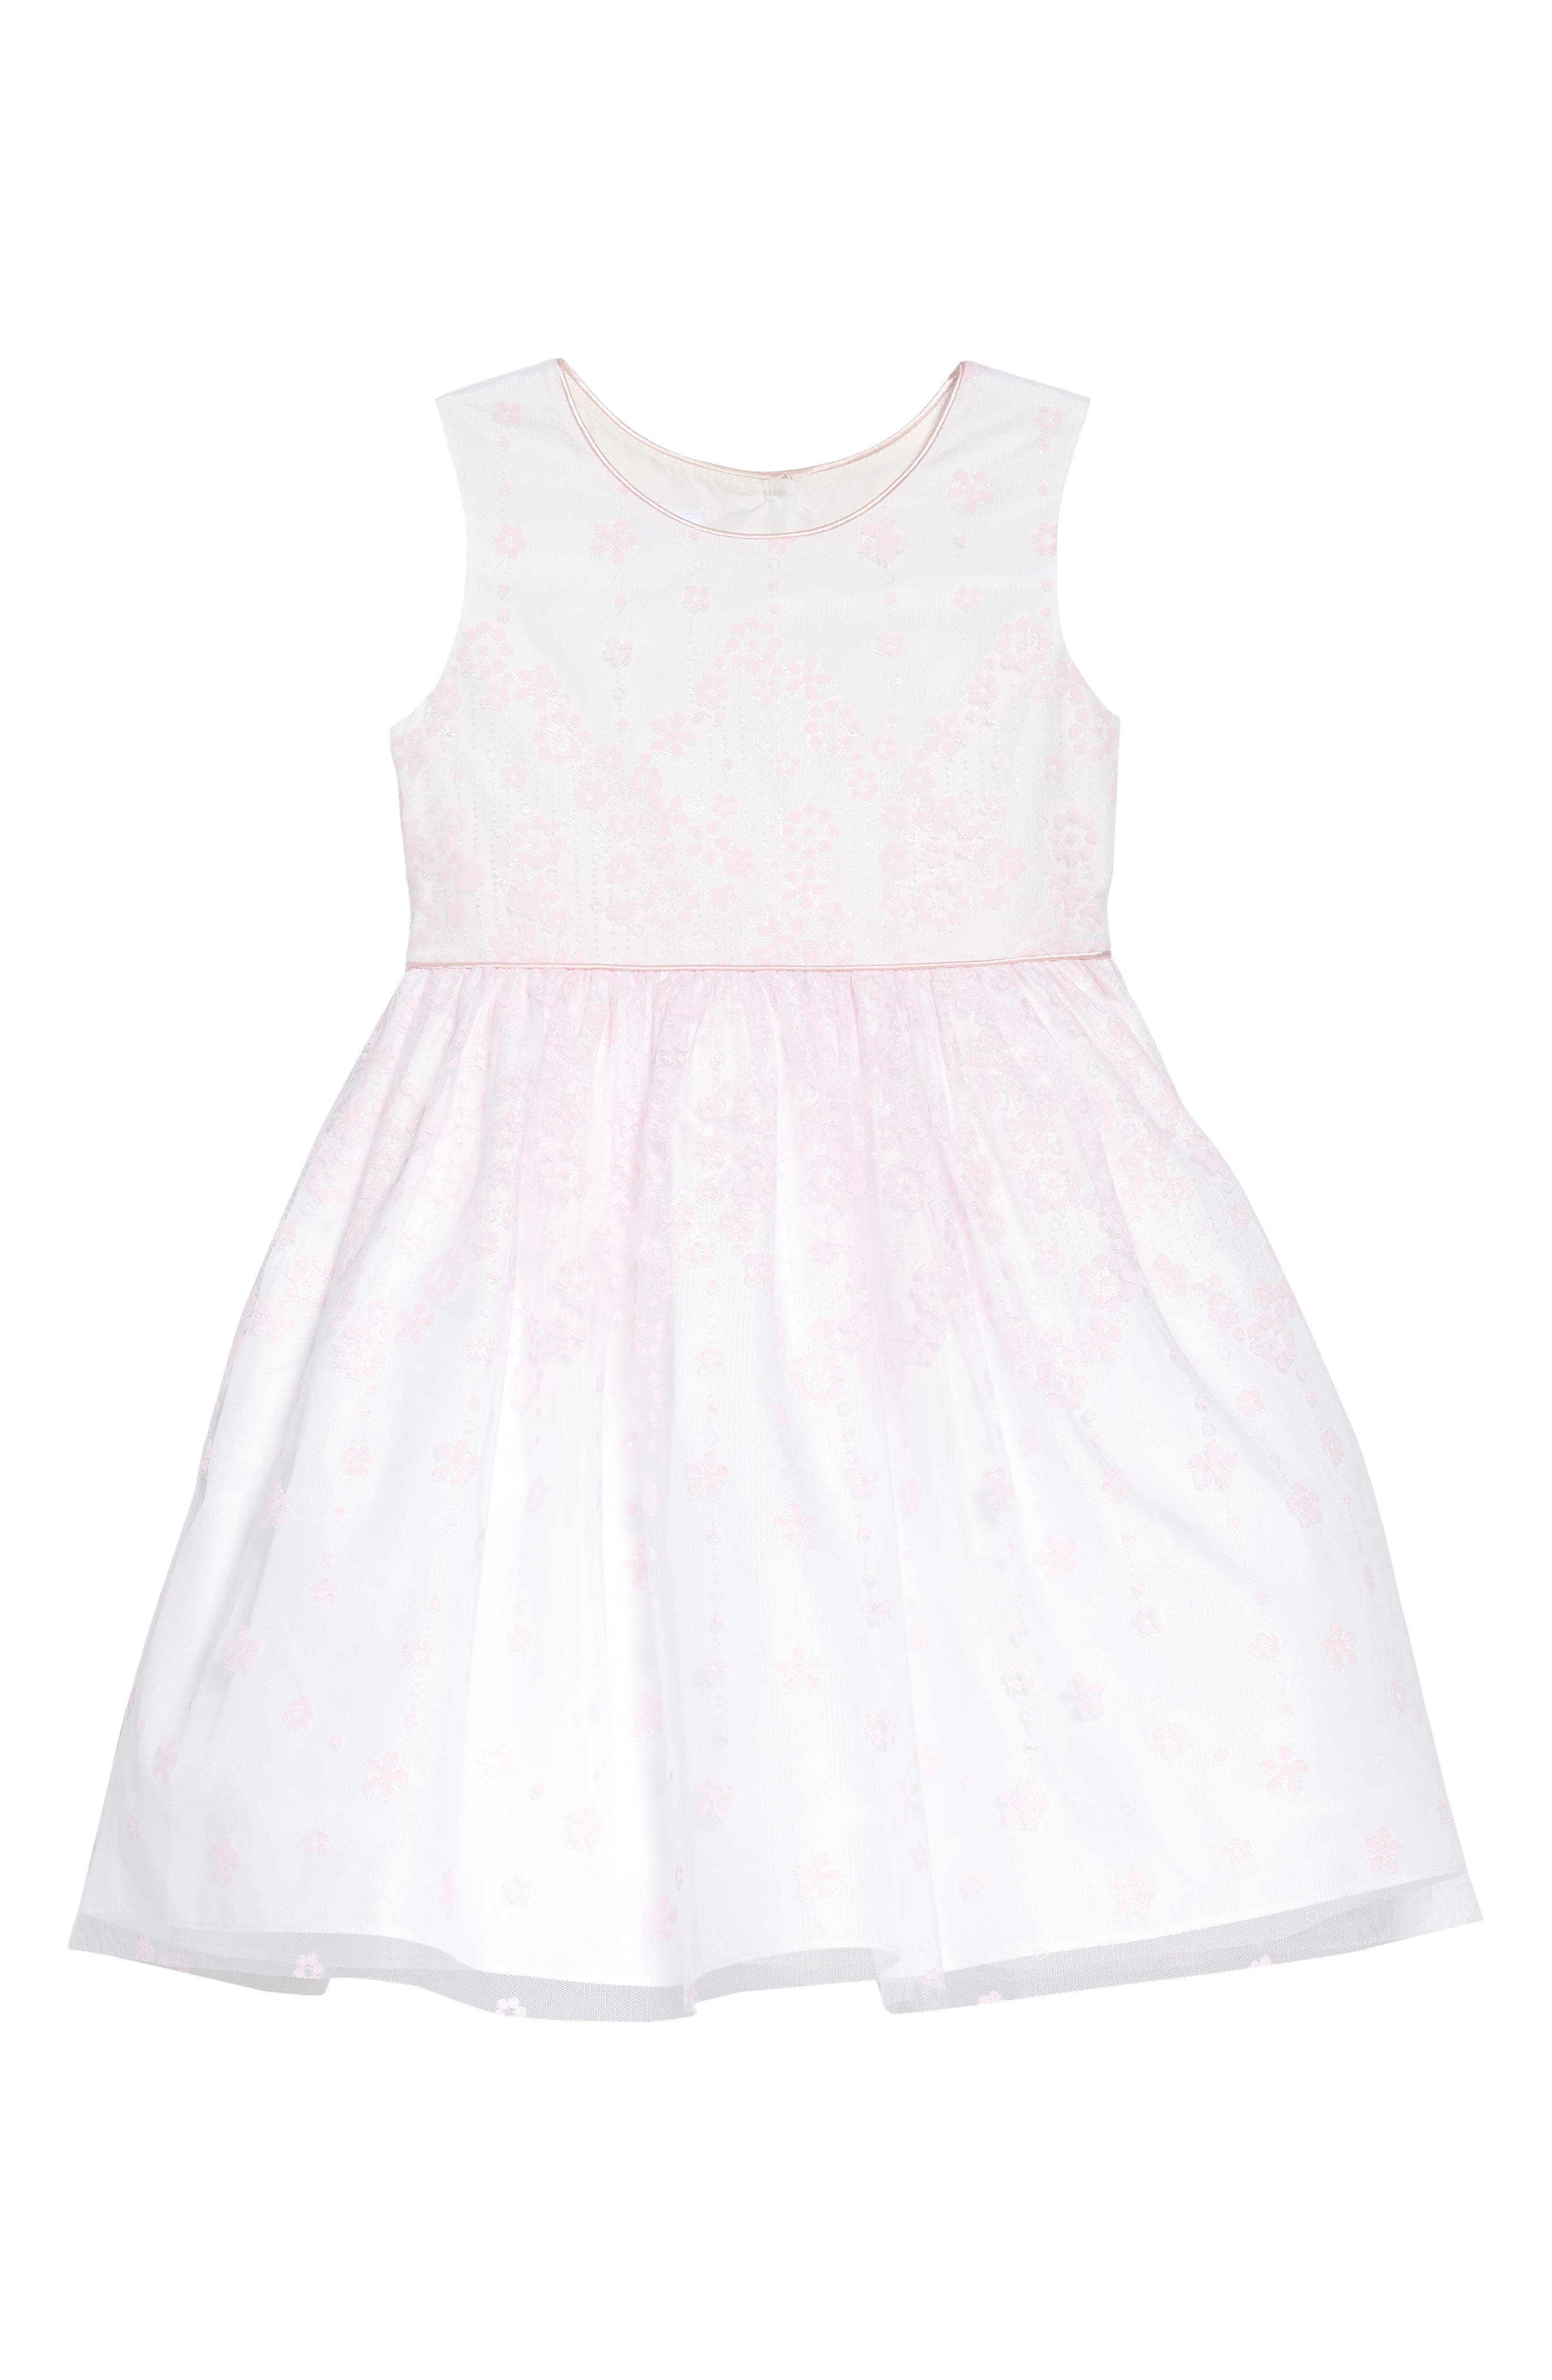 FRAIS Flower Glitter Fit & Flare Dress, Main, color, PINK